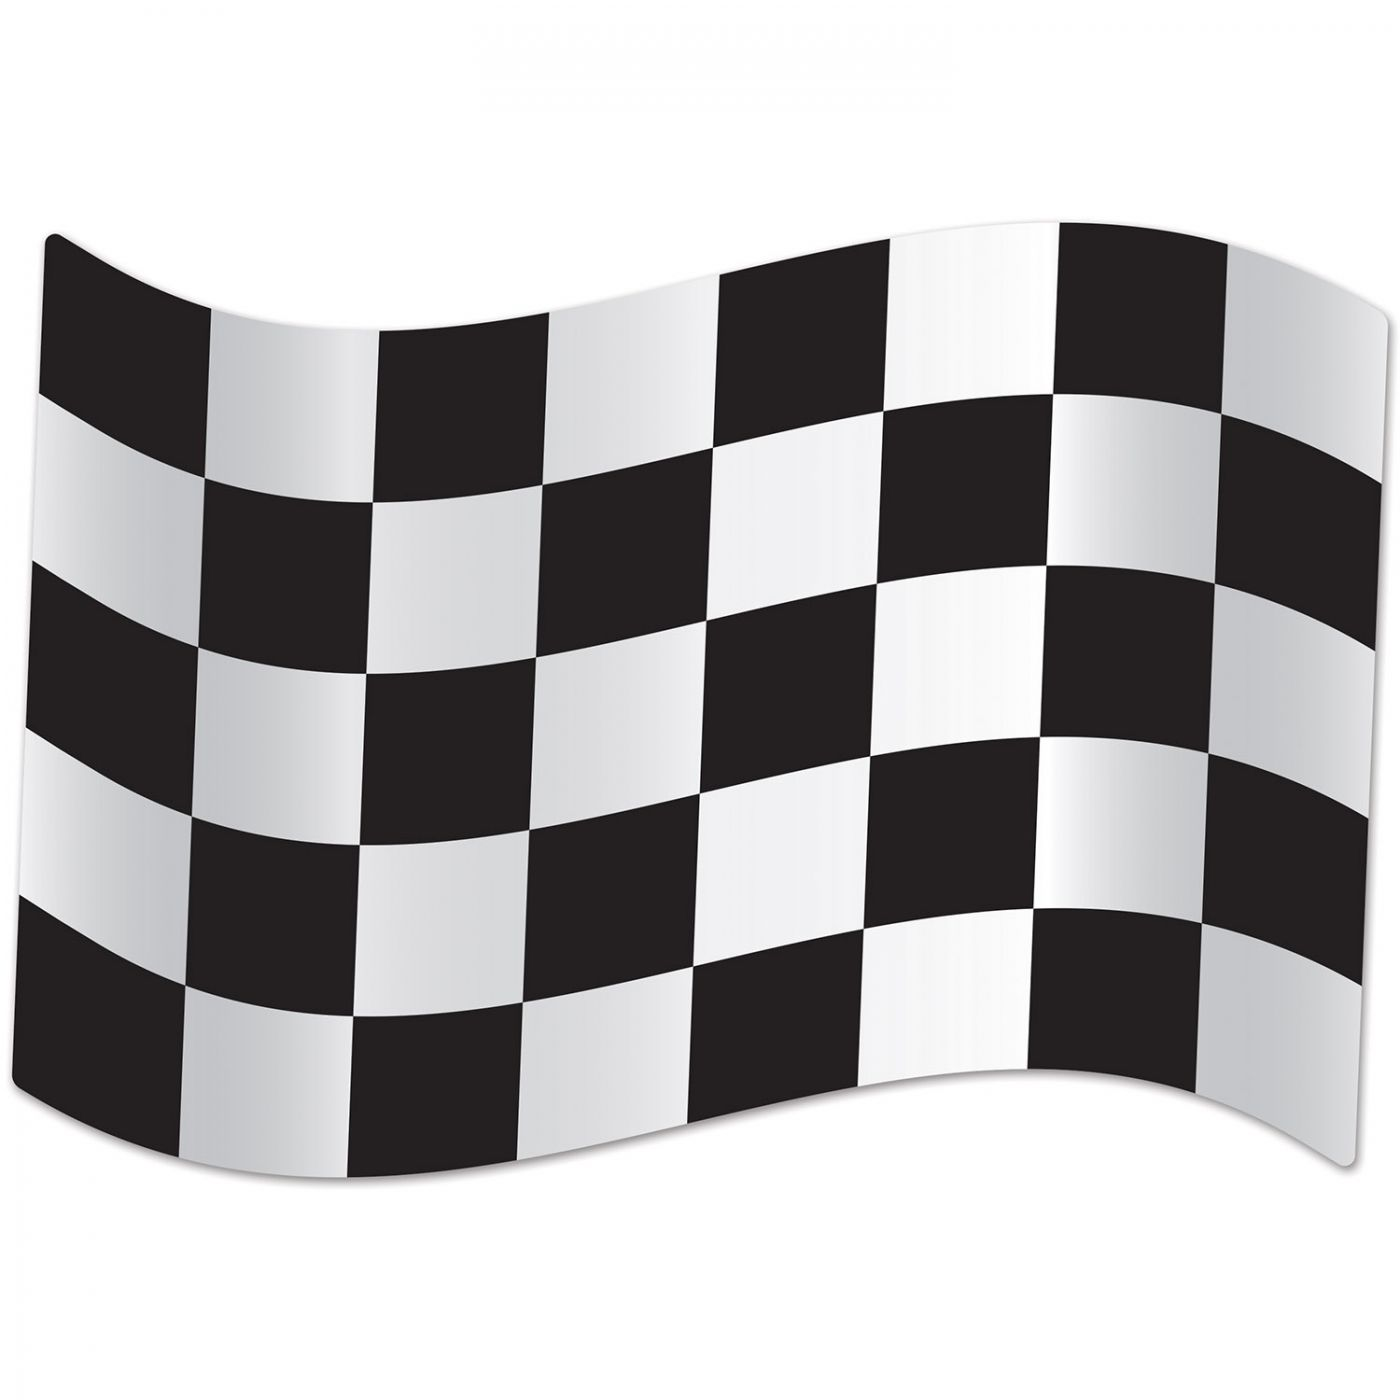 Jumbo Checkered Flag Cutouts image